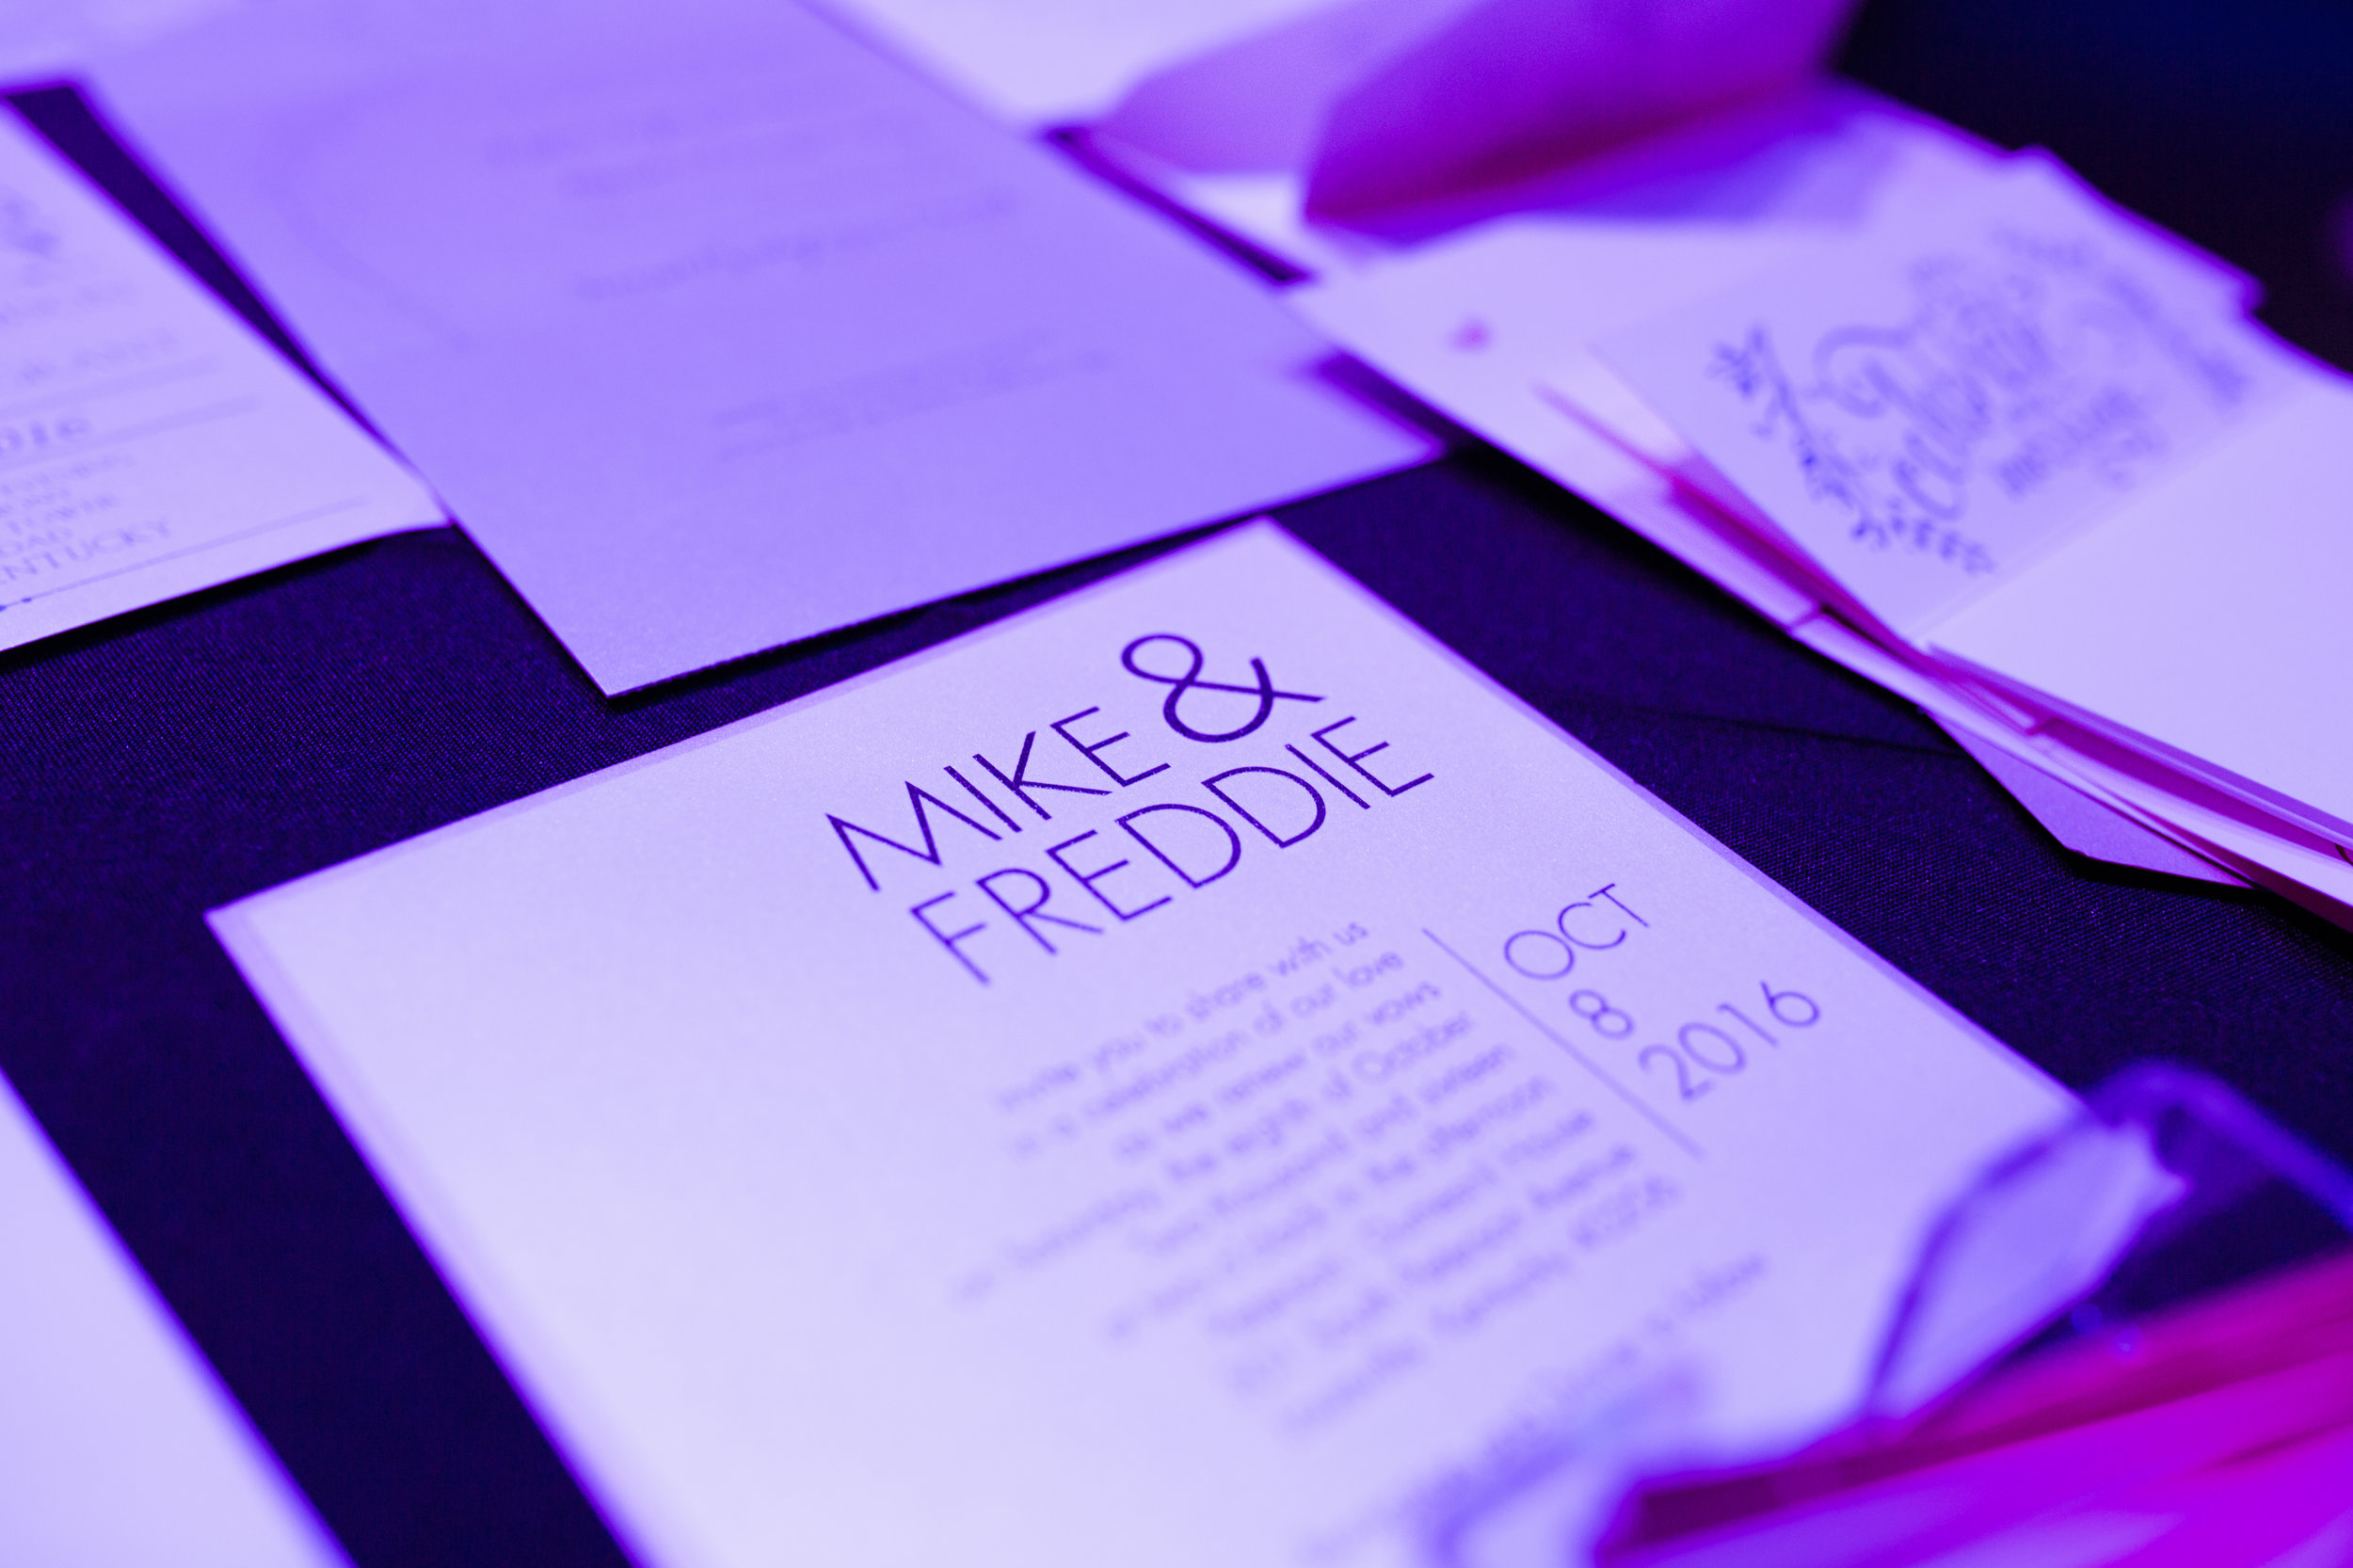 Modern Louisville Magazine Modern Vows Launch Party at Mercury Ballroom 5-17-17 Crystal Ludwick Photo 21.jpg